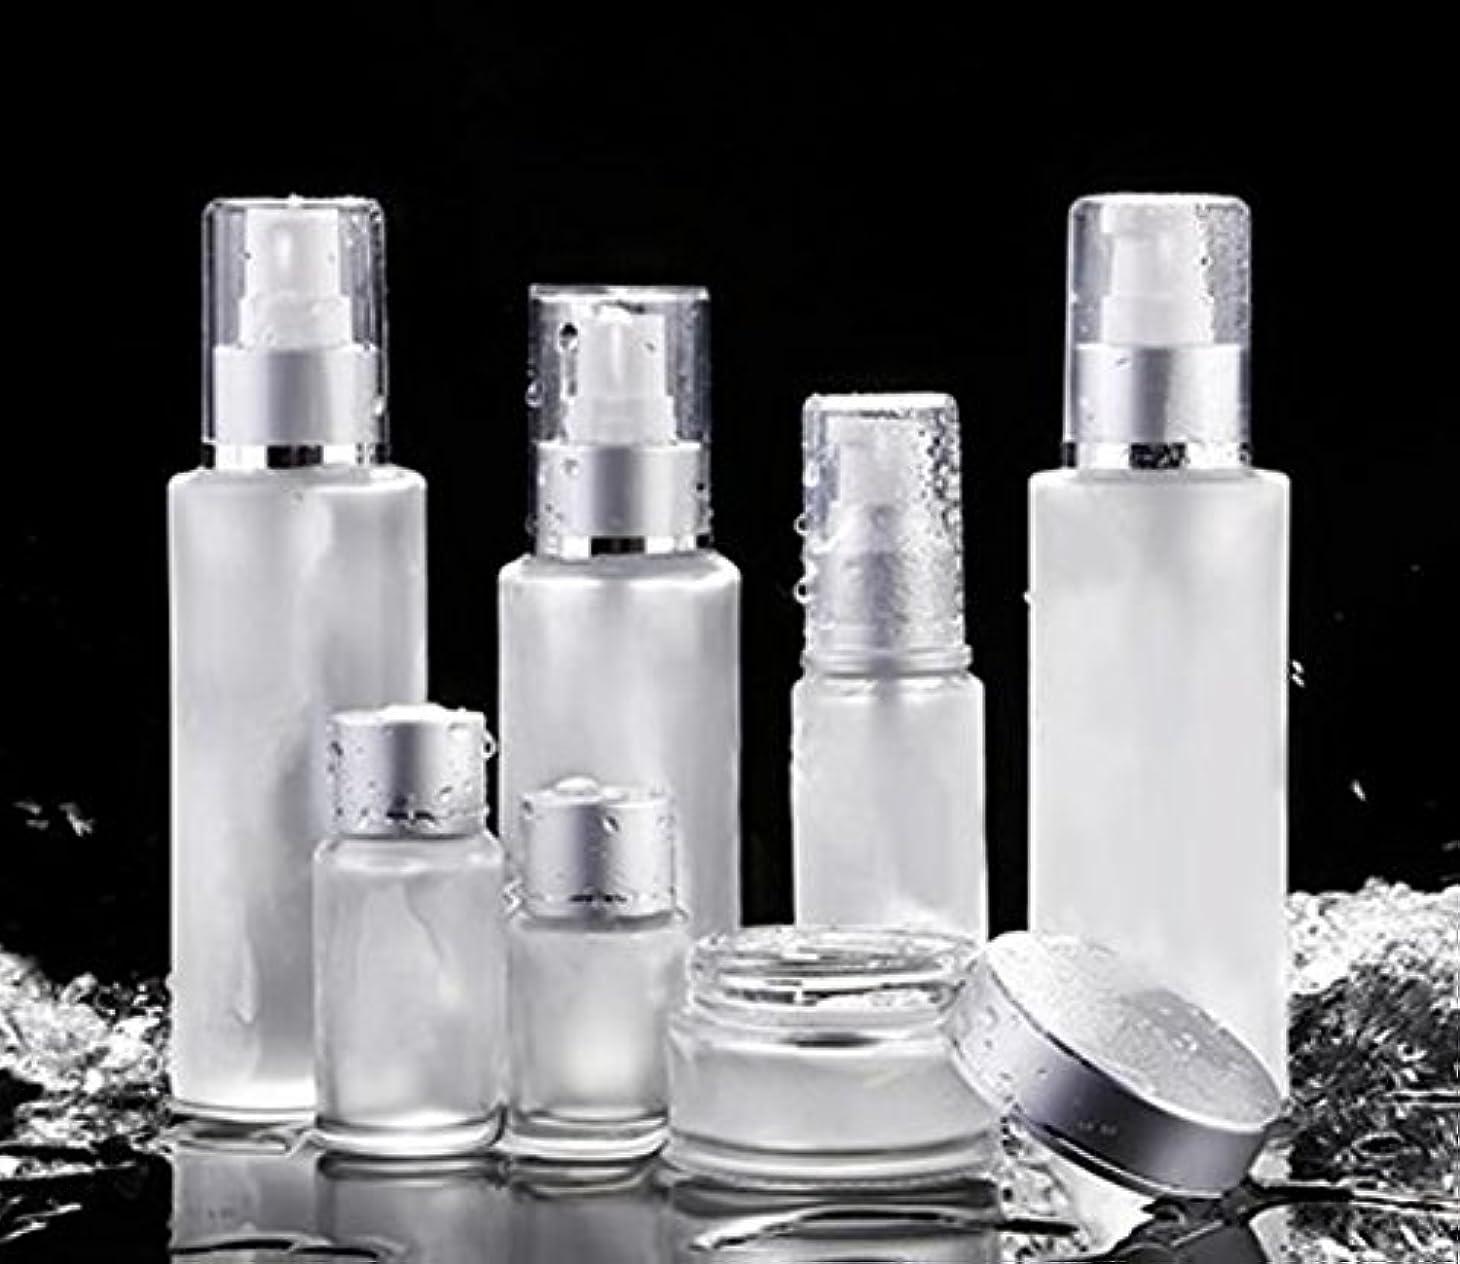 ShopXJ 化粧水 容器 スプレー 詰め替え 携帯 ボトル プッシュ ボトル 旅行 お出かけ 外泊に (50ml)